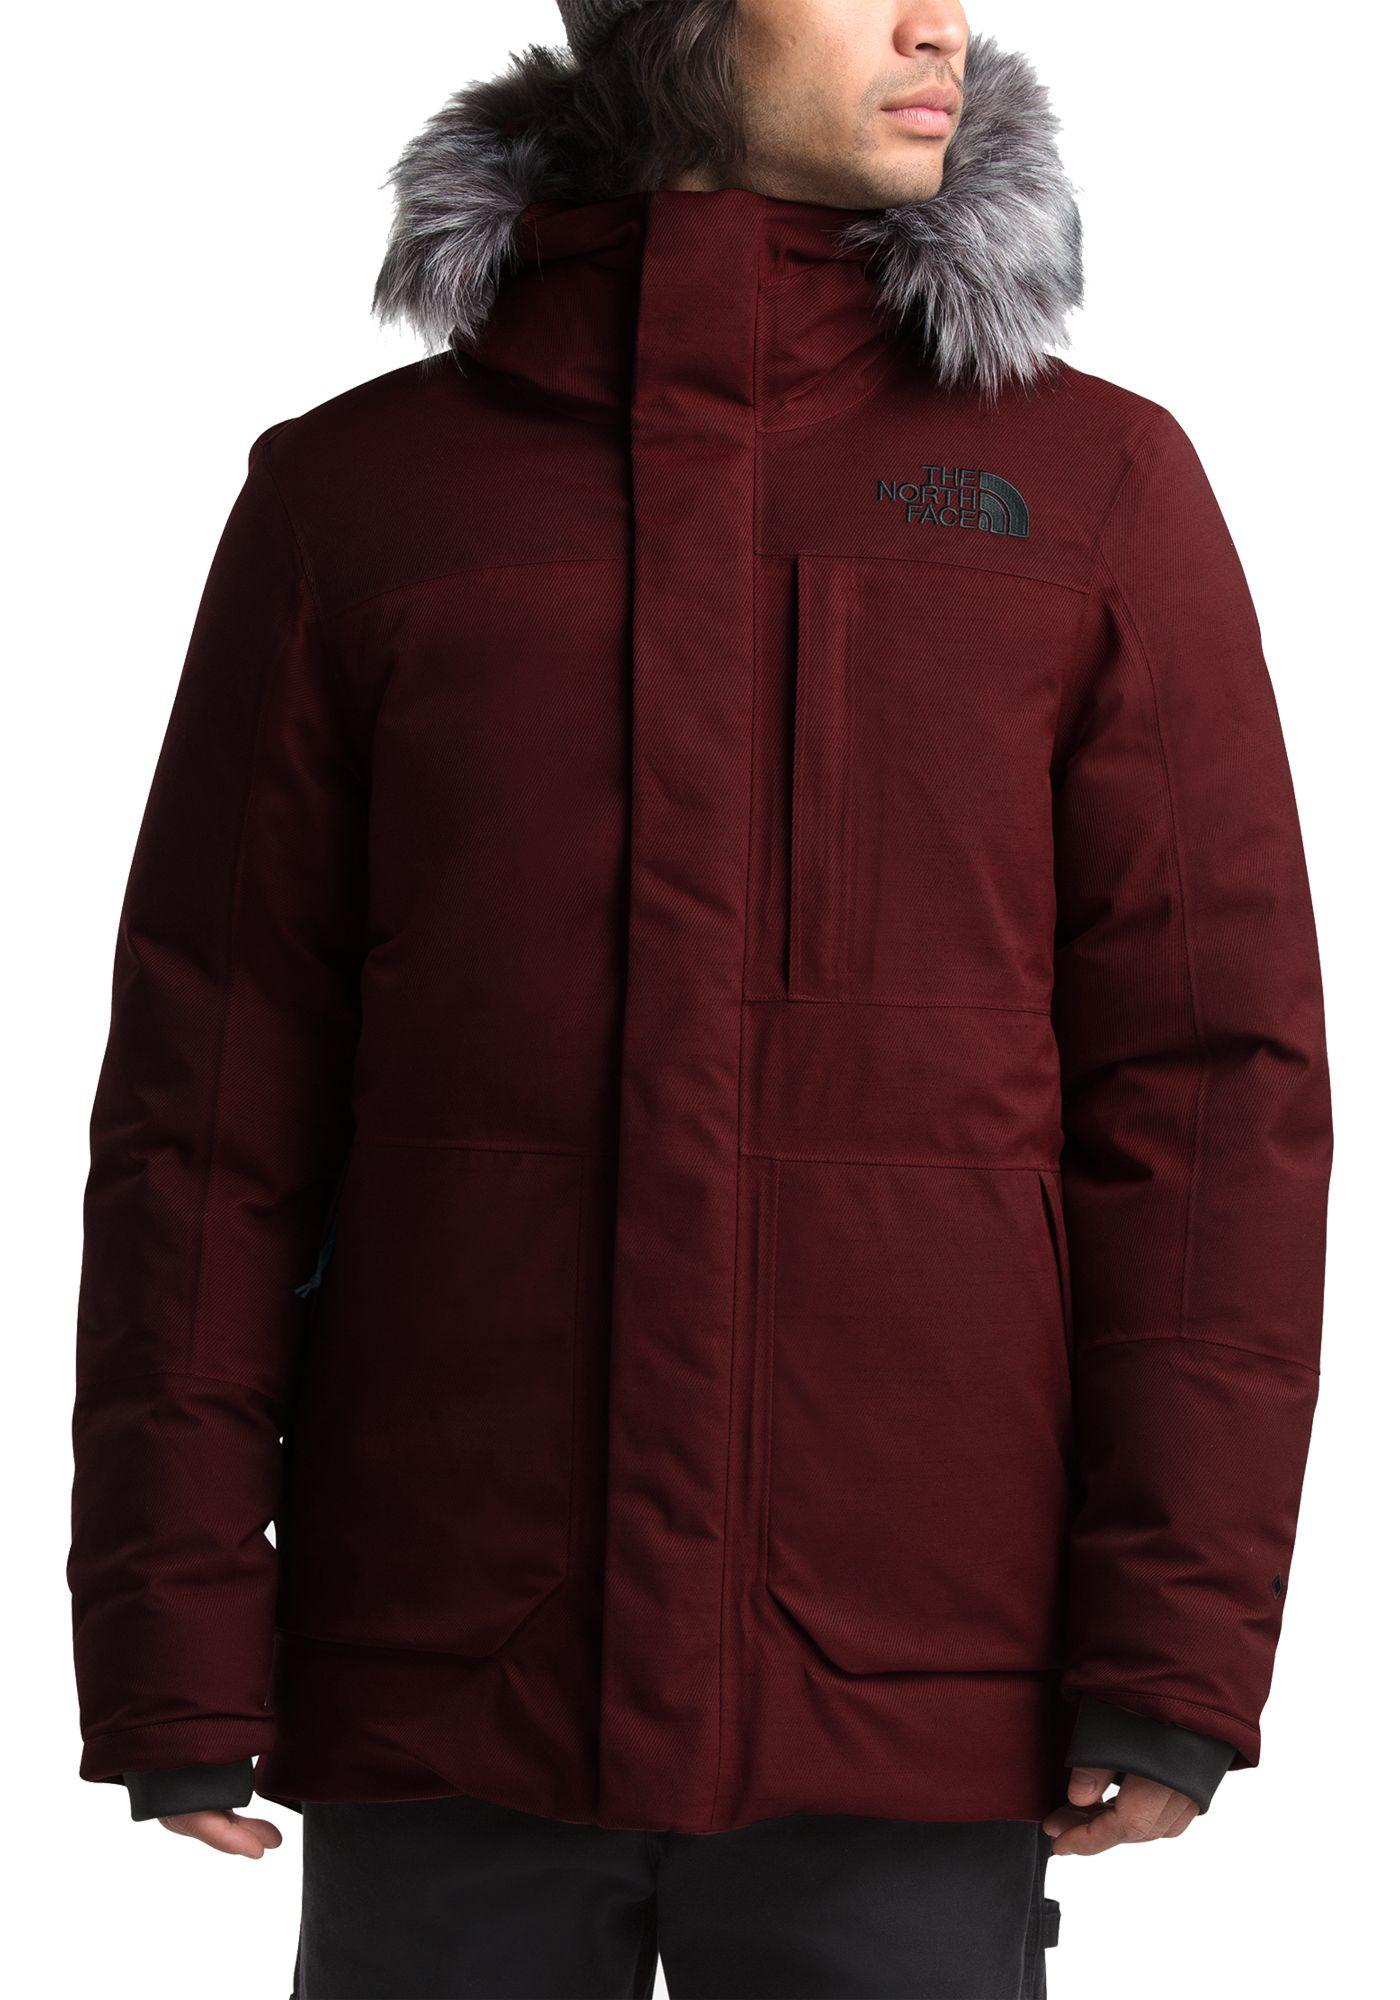 The North Face Men's Defdown GTX II Jacket